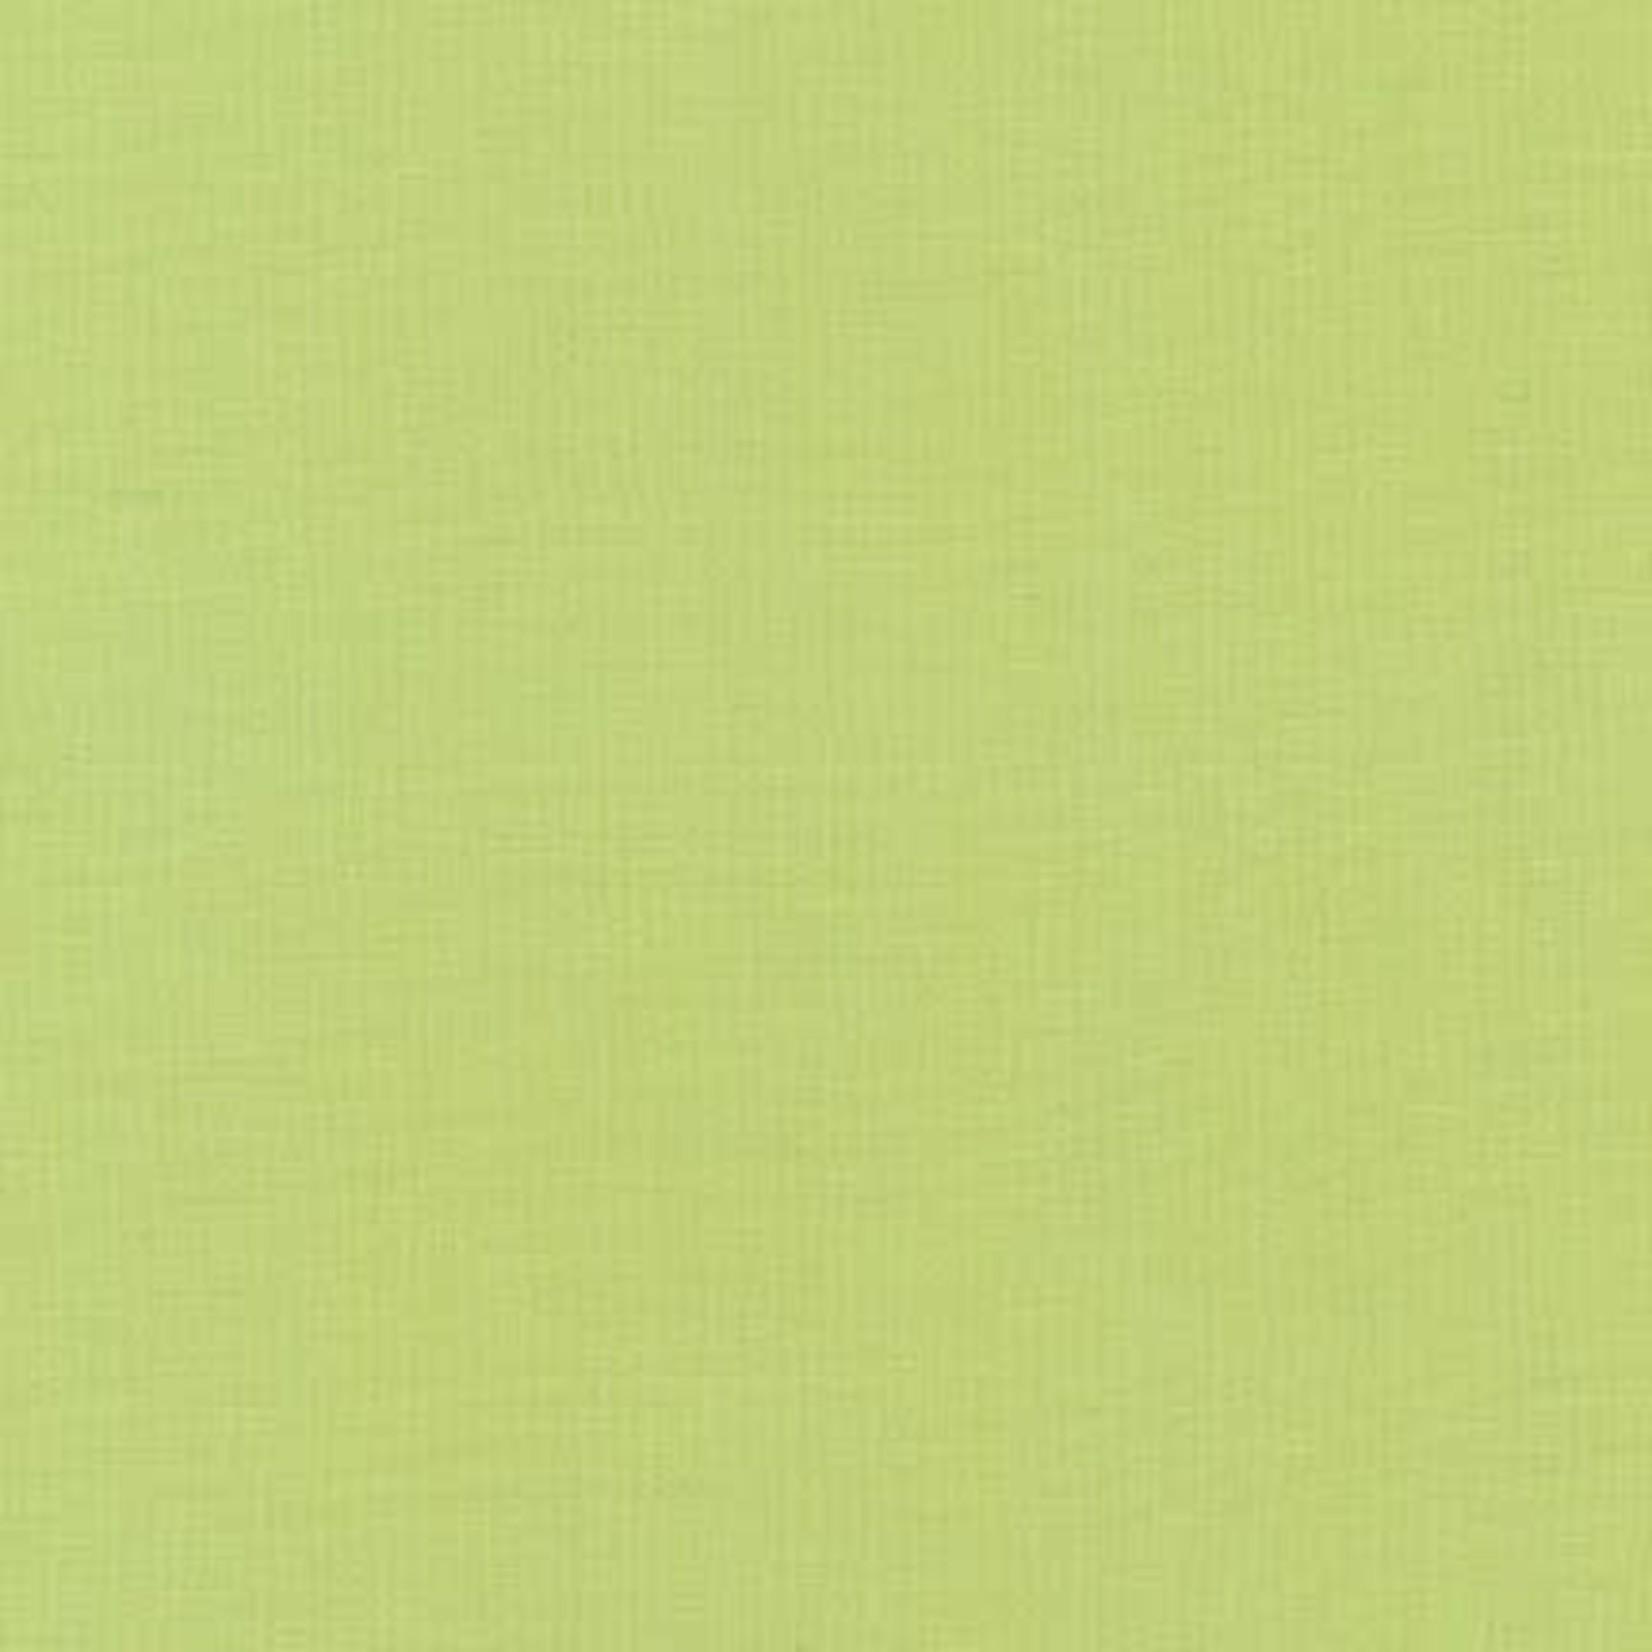 KONA KONA  K001-351 GREEN TEA, PER CM OR $14/M